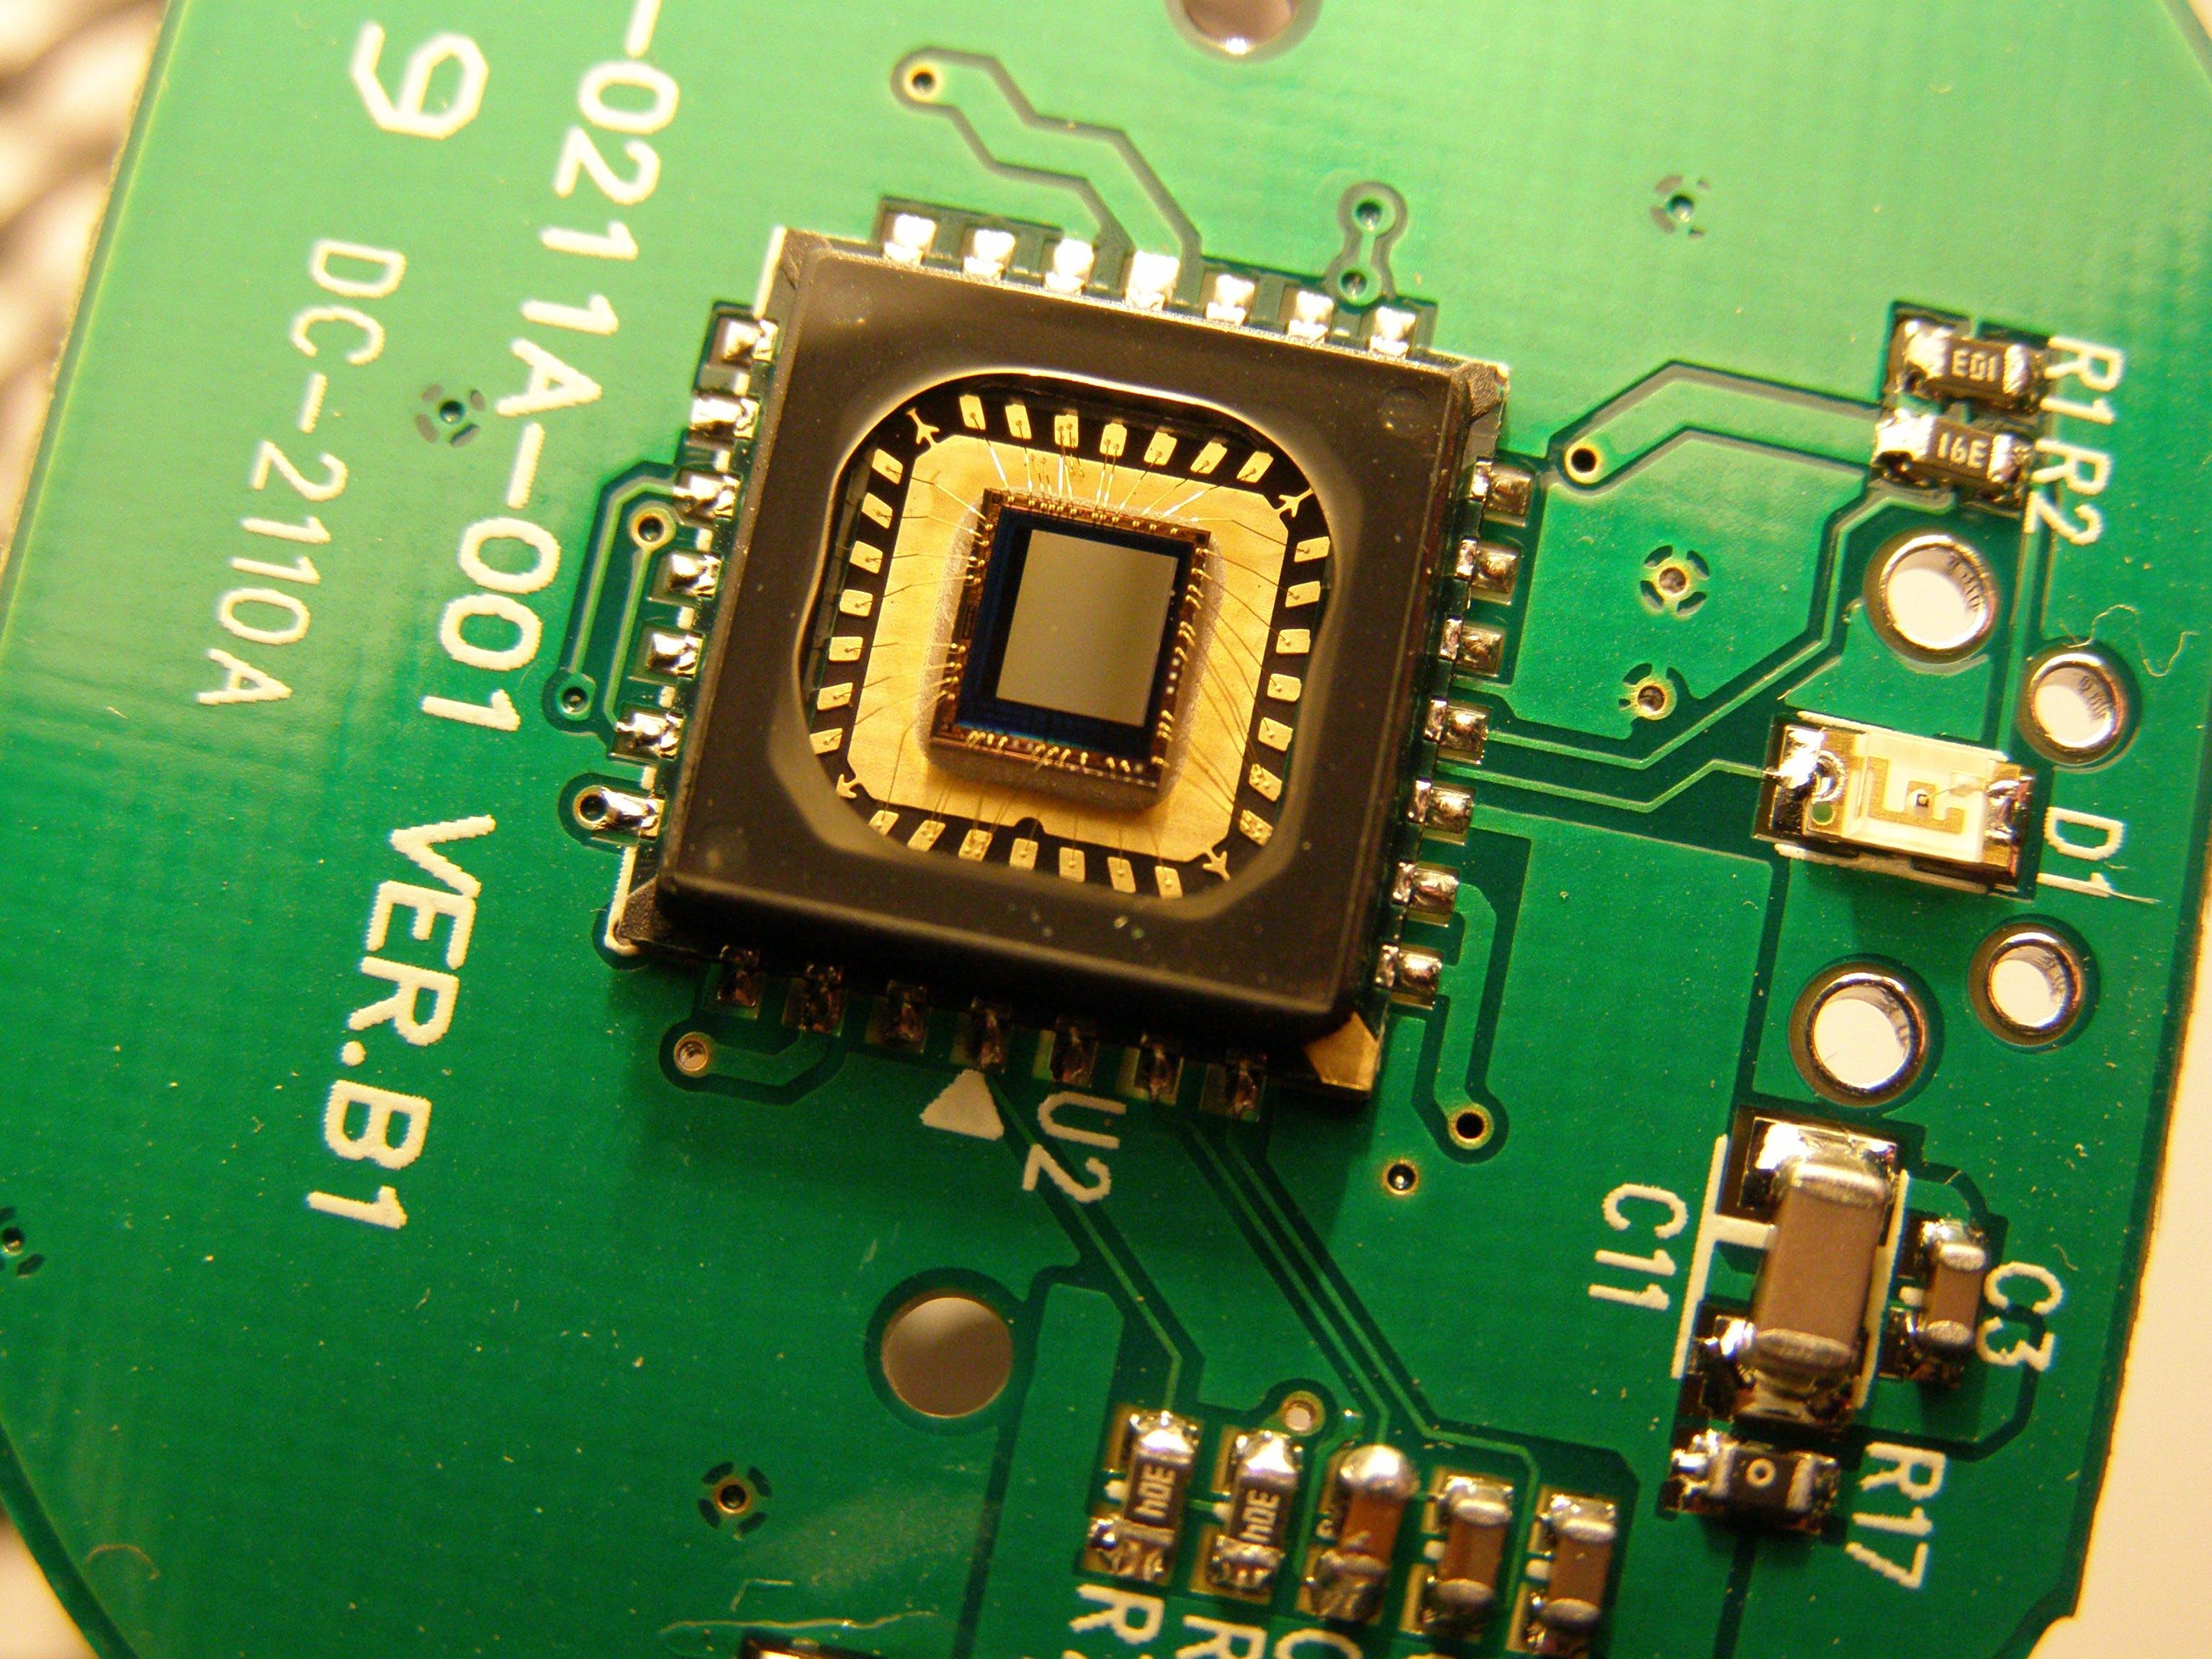 Image showing a camera sensor.